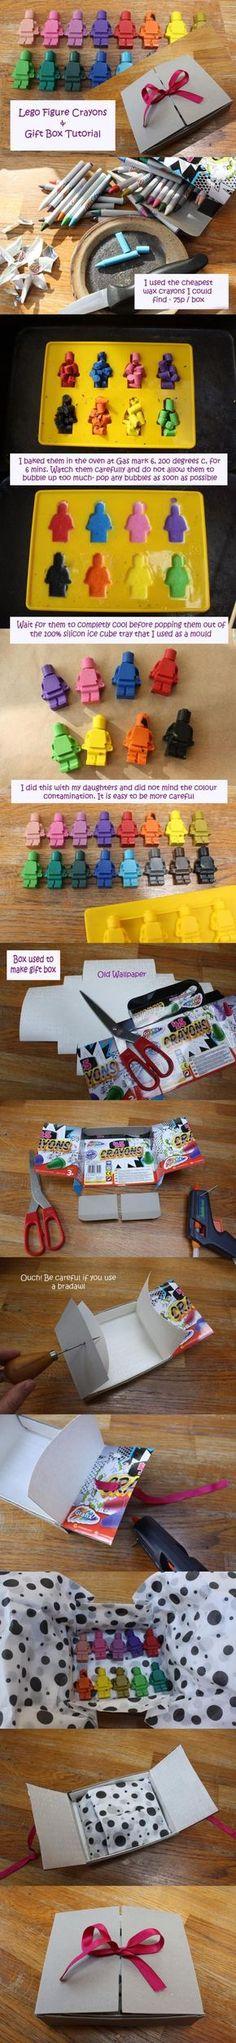 Make It: Lego Man Crayons - Tutorial #kids by Divonsir Borges